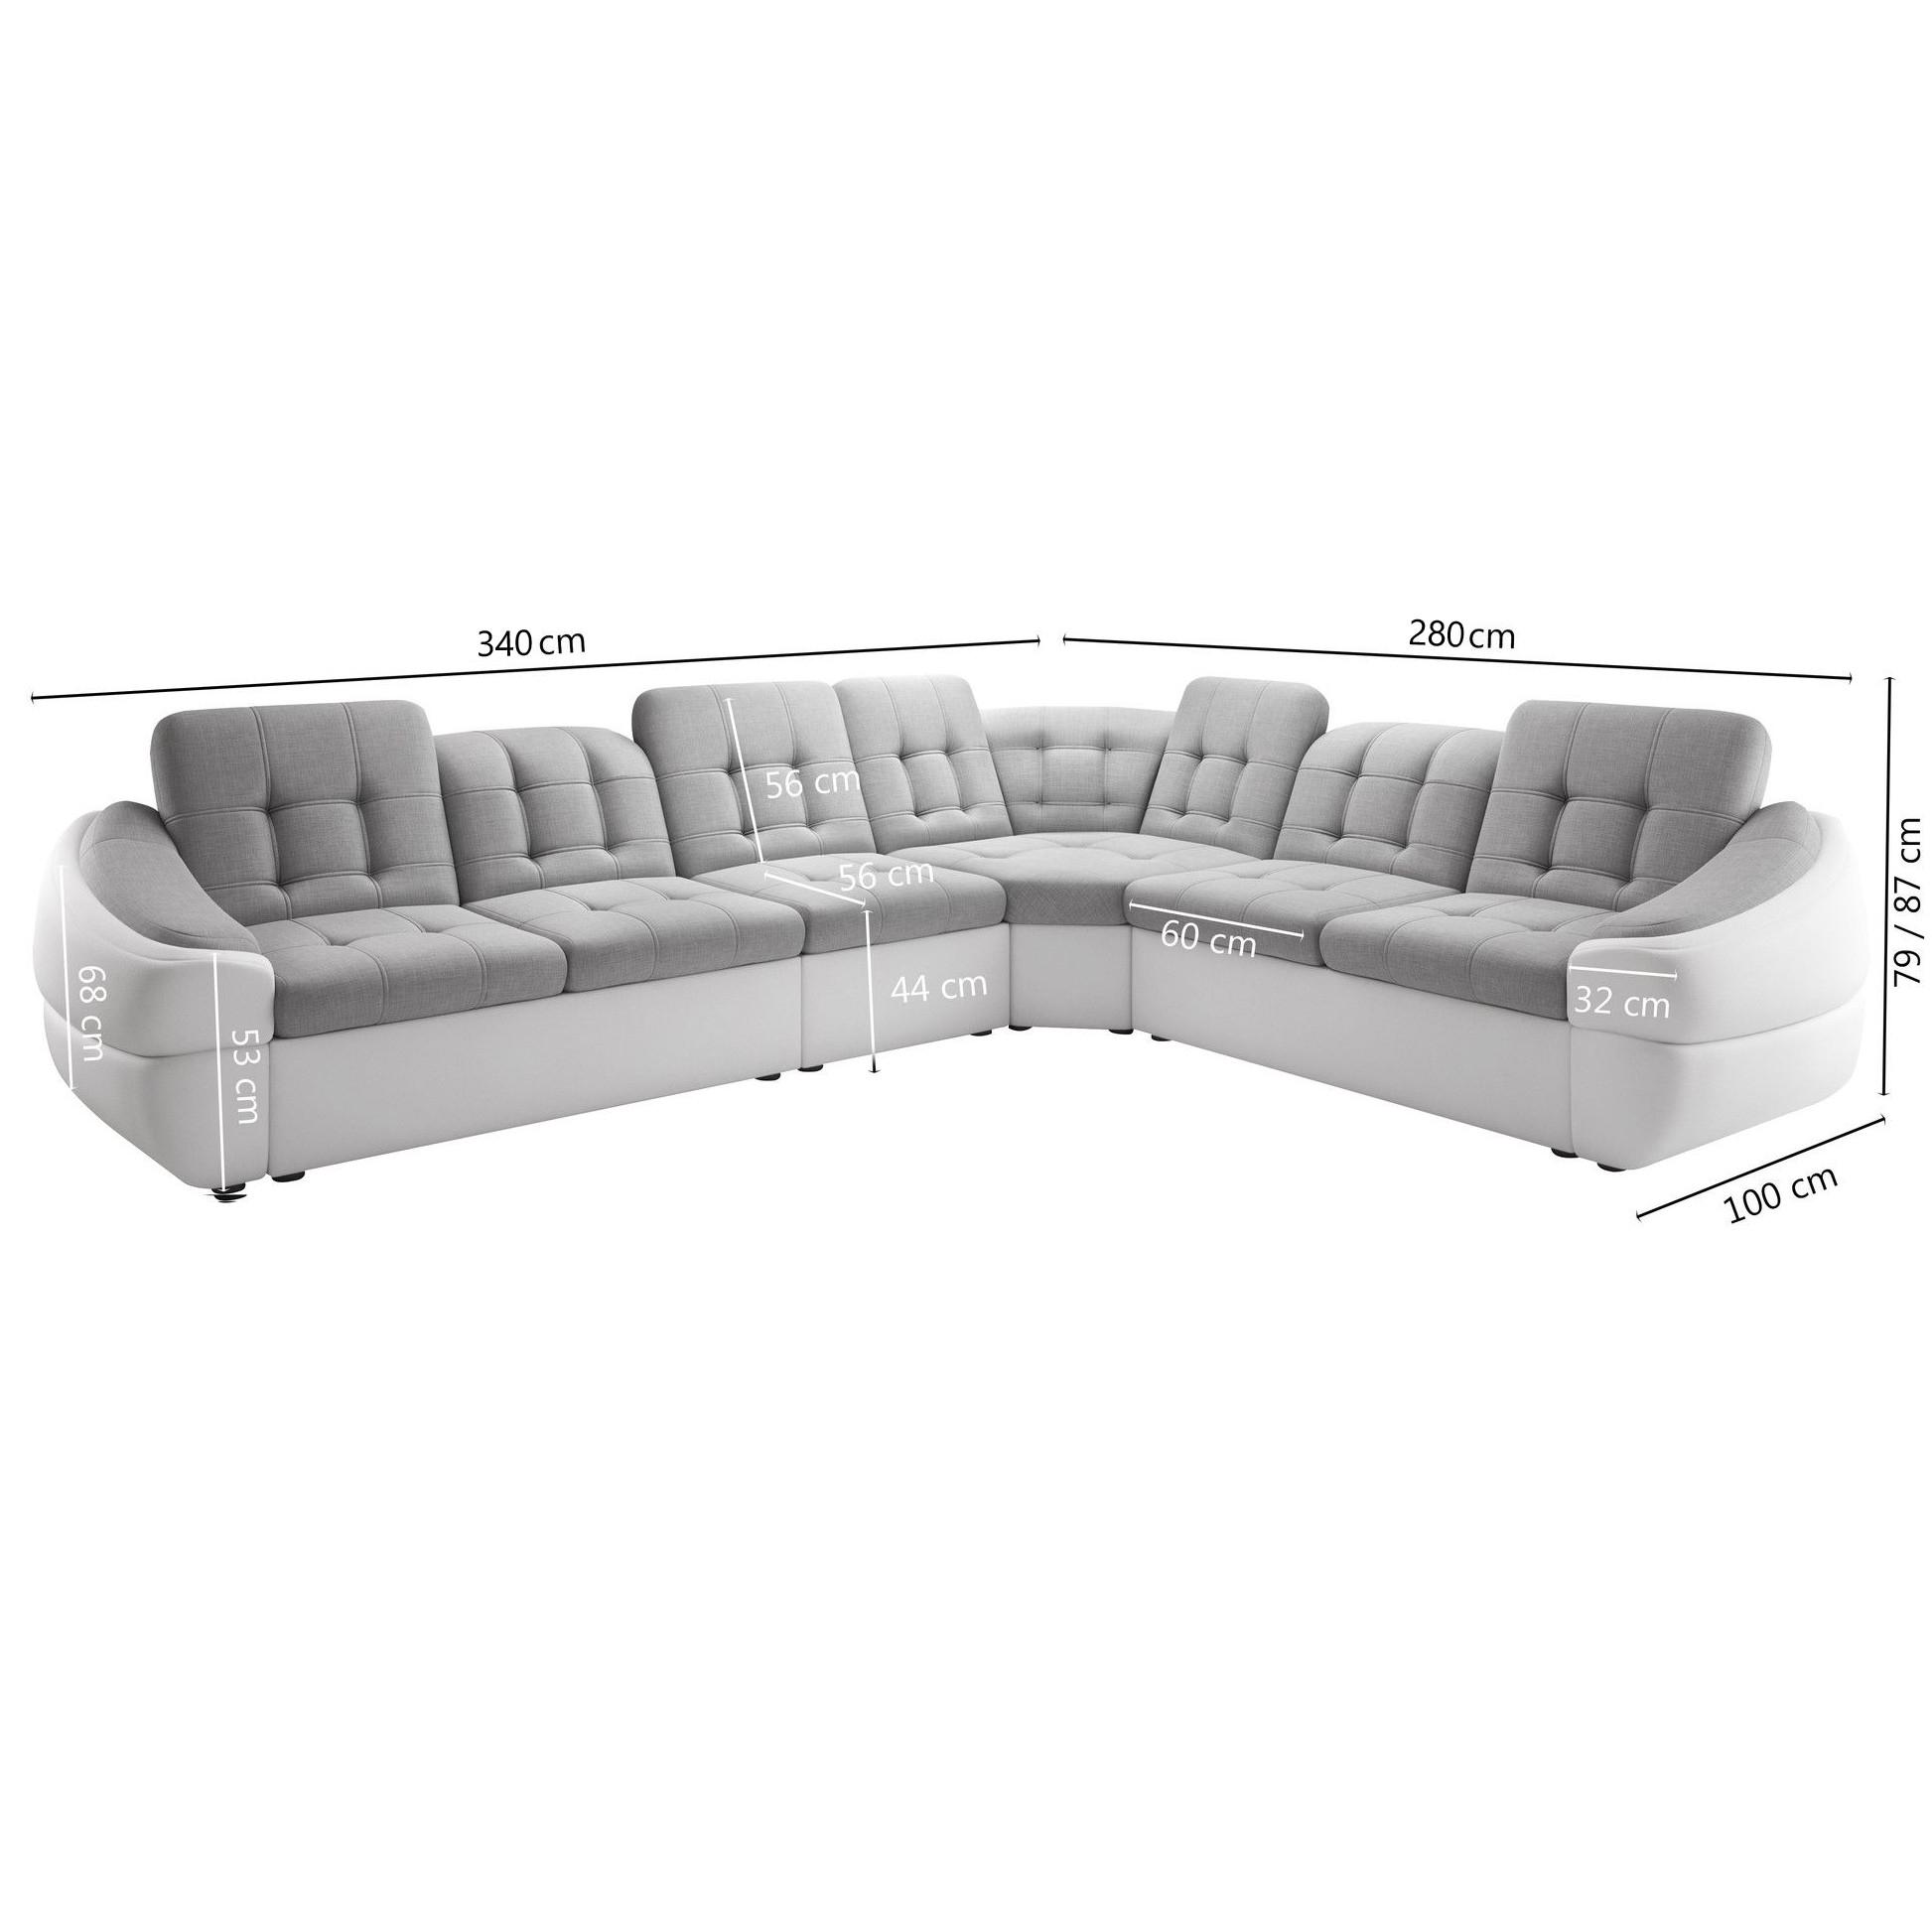 Canapé D Angle Cuir Beige Salon Canapé D'angle Ultra Design Avec Angle Réversible